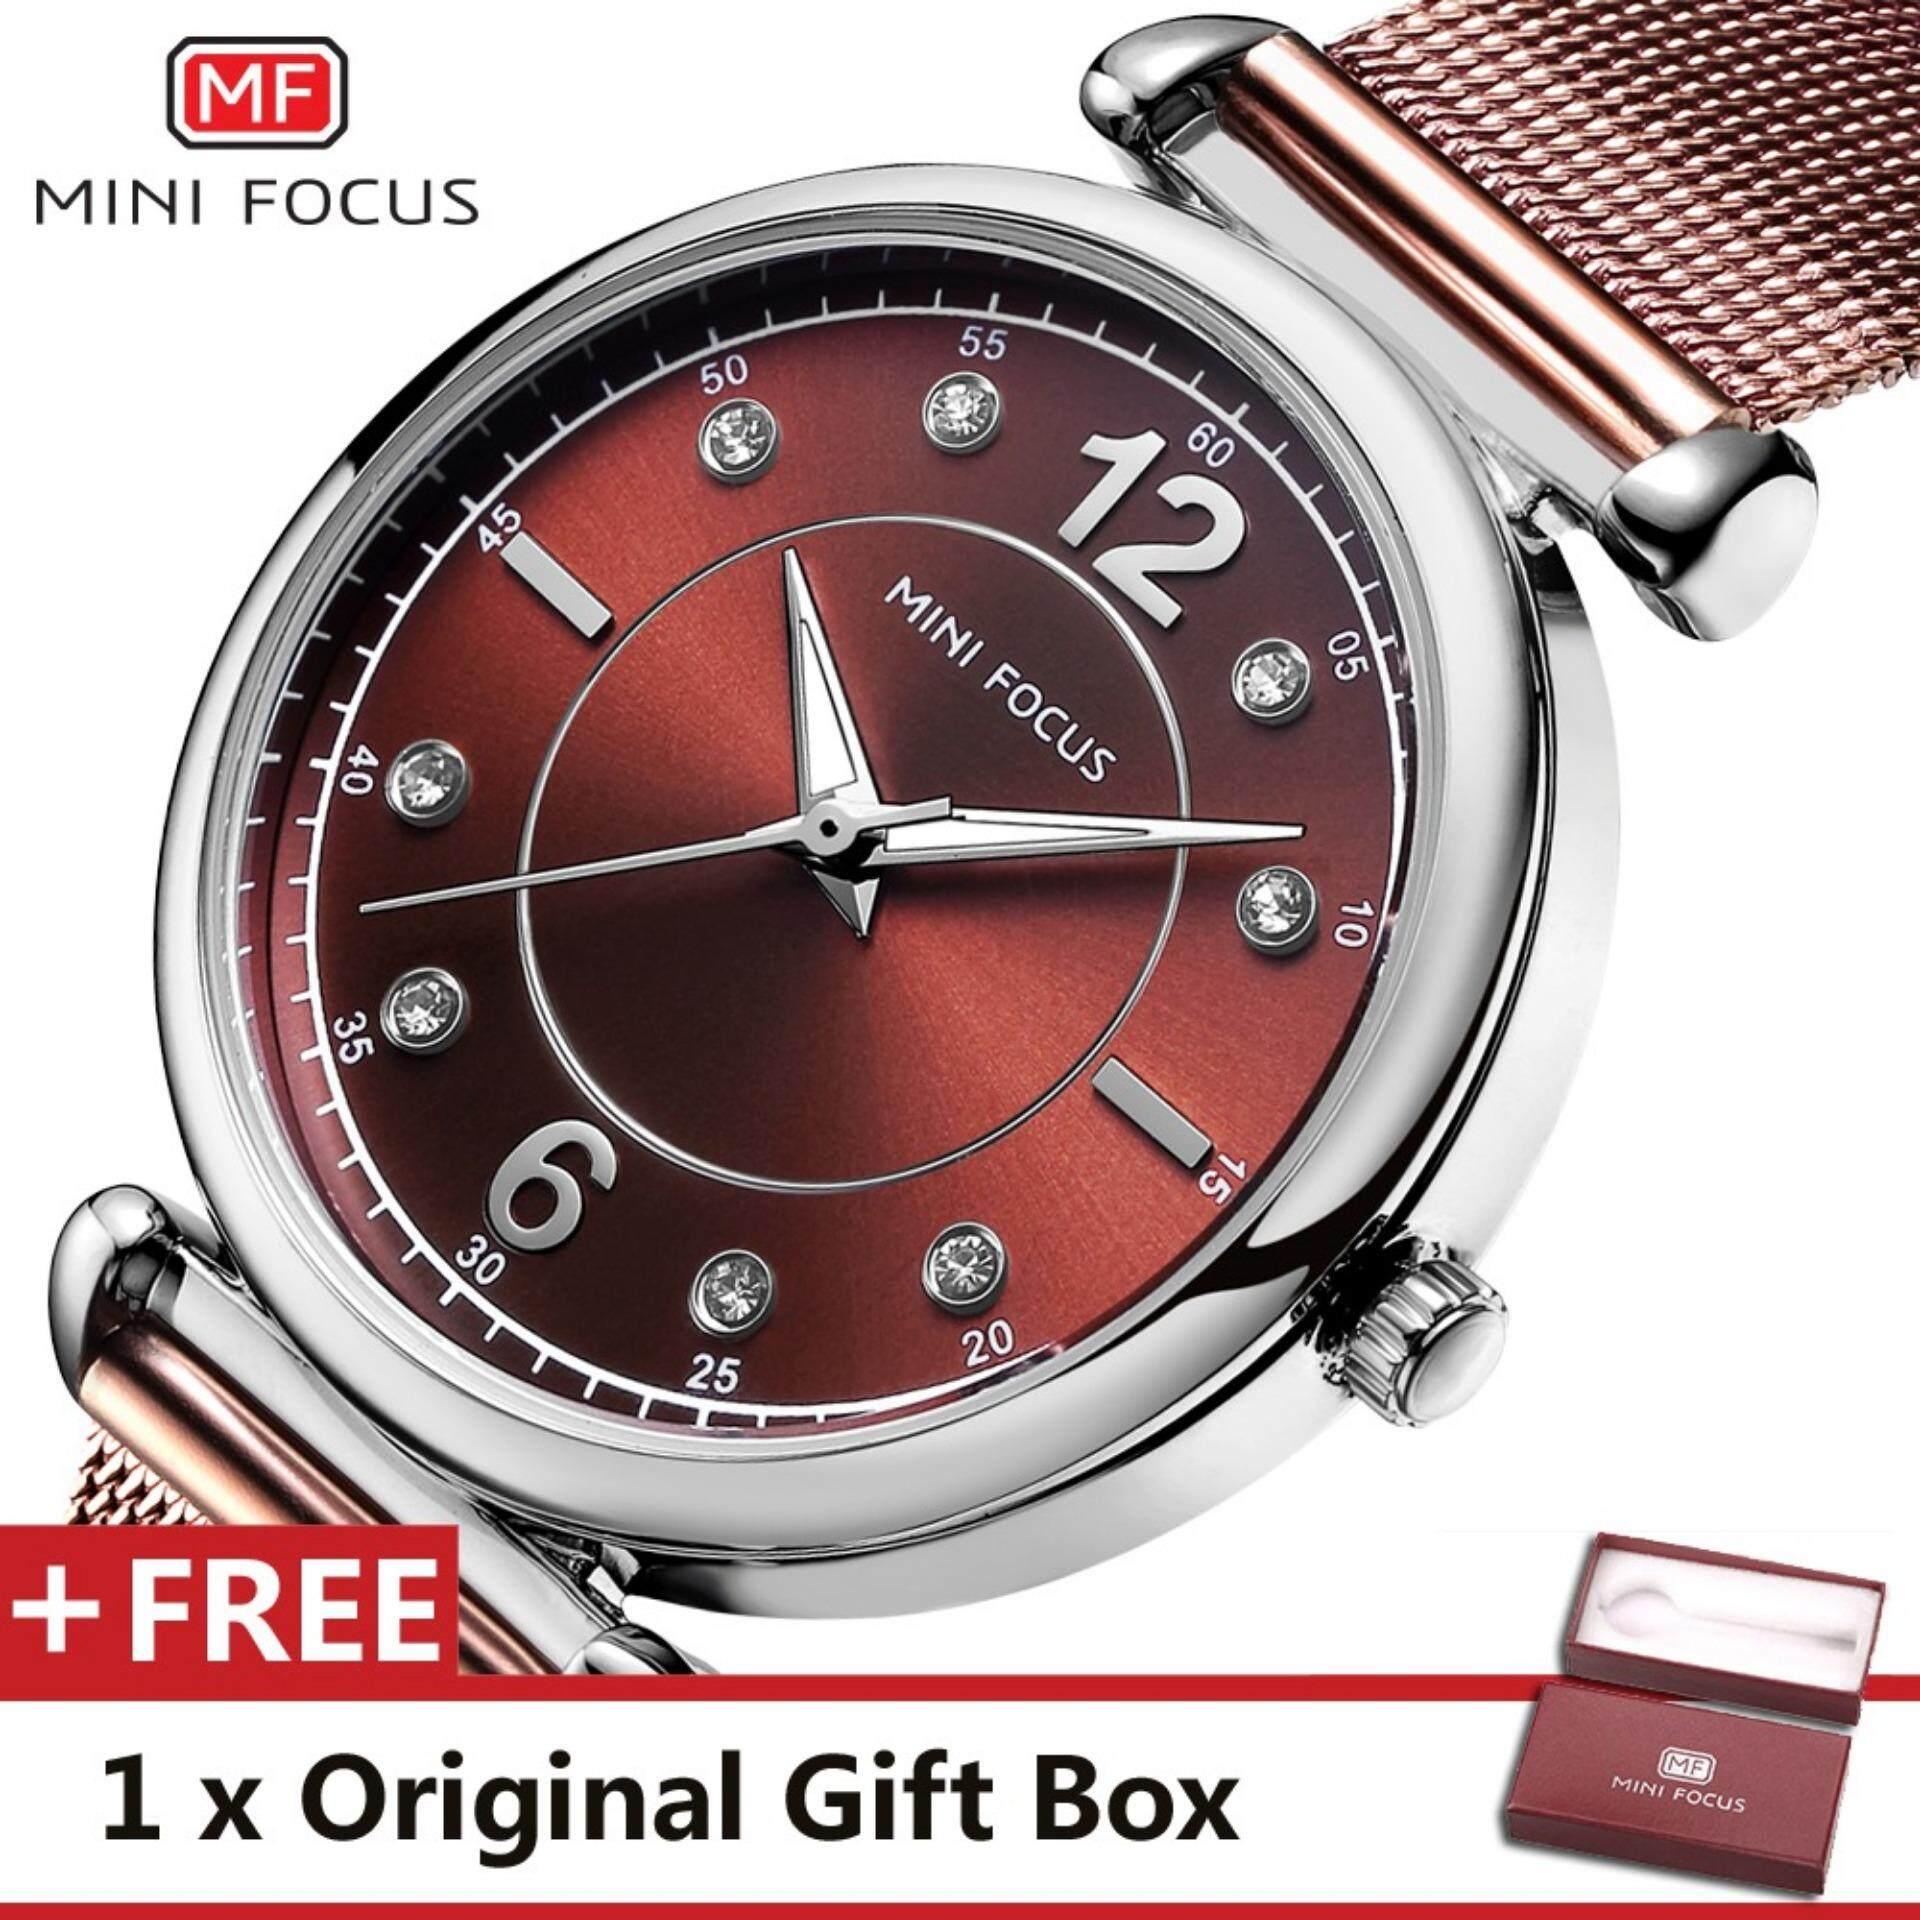 fba2c83bfed MINI FOCUS Top Luxury Brand Watch Famous Fashion Dress Women Quartz Watches  Womens Trand Wristwatch Gift